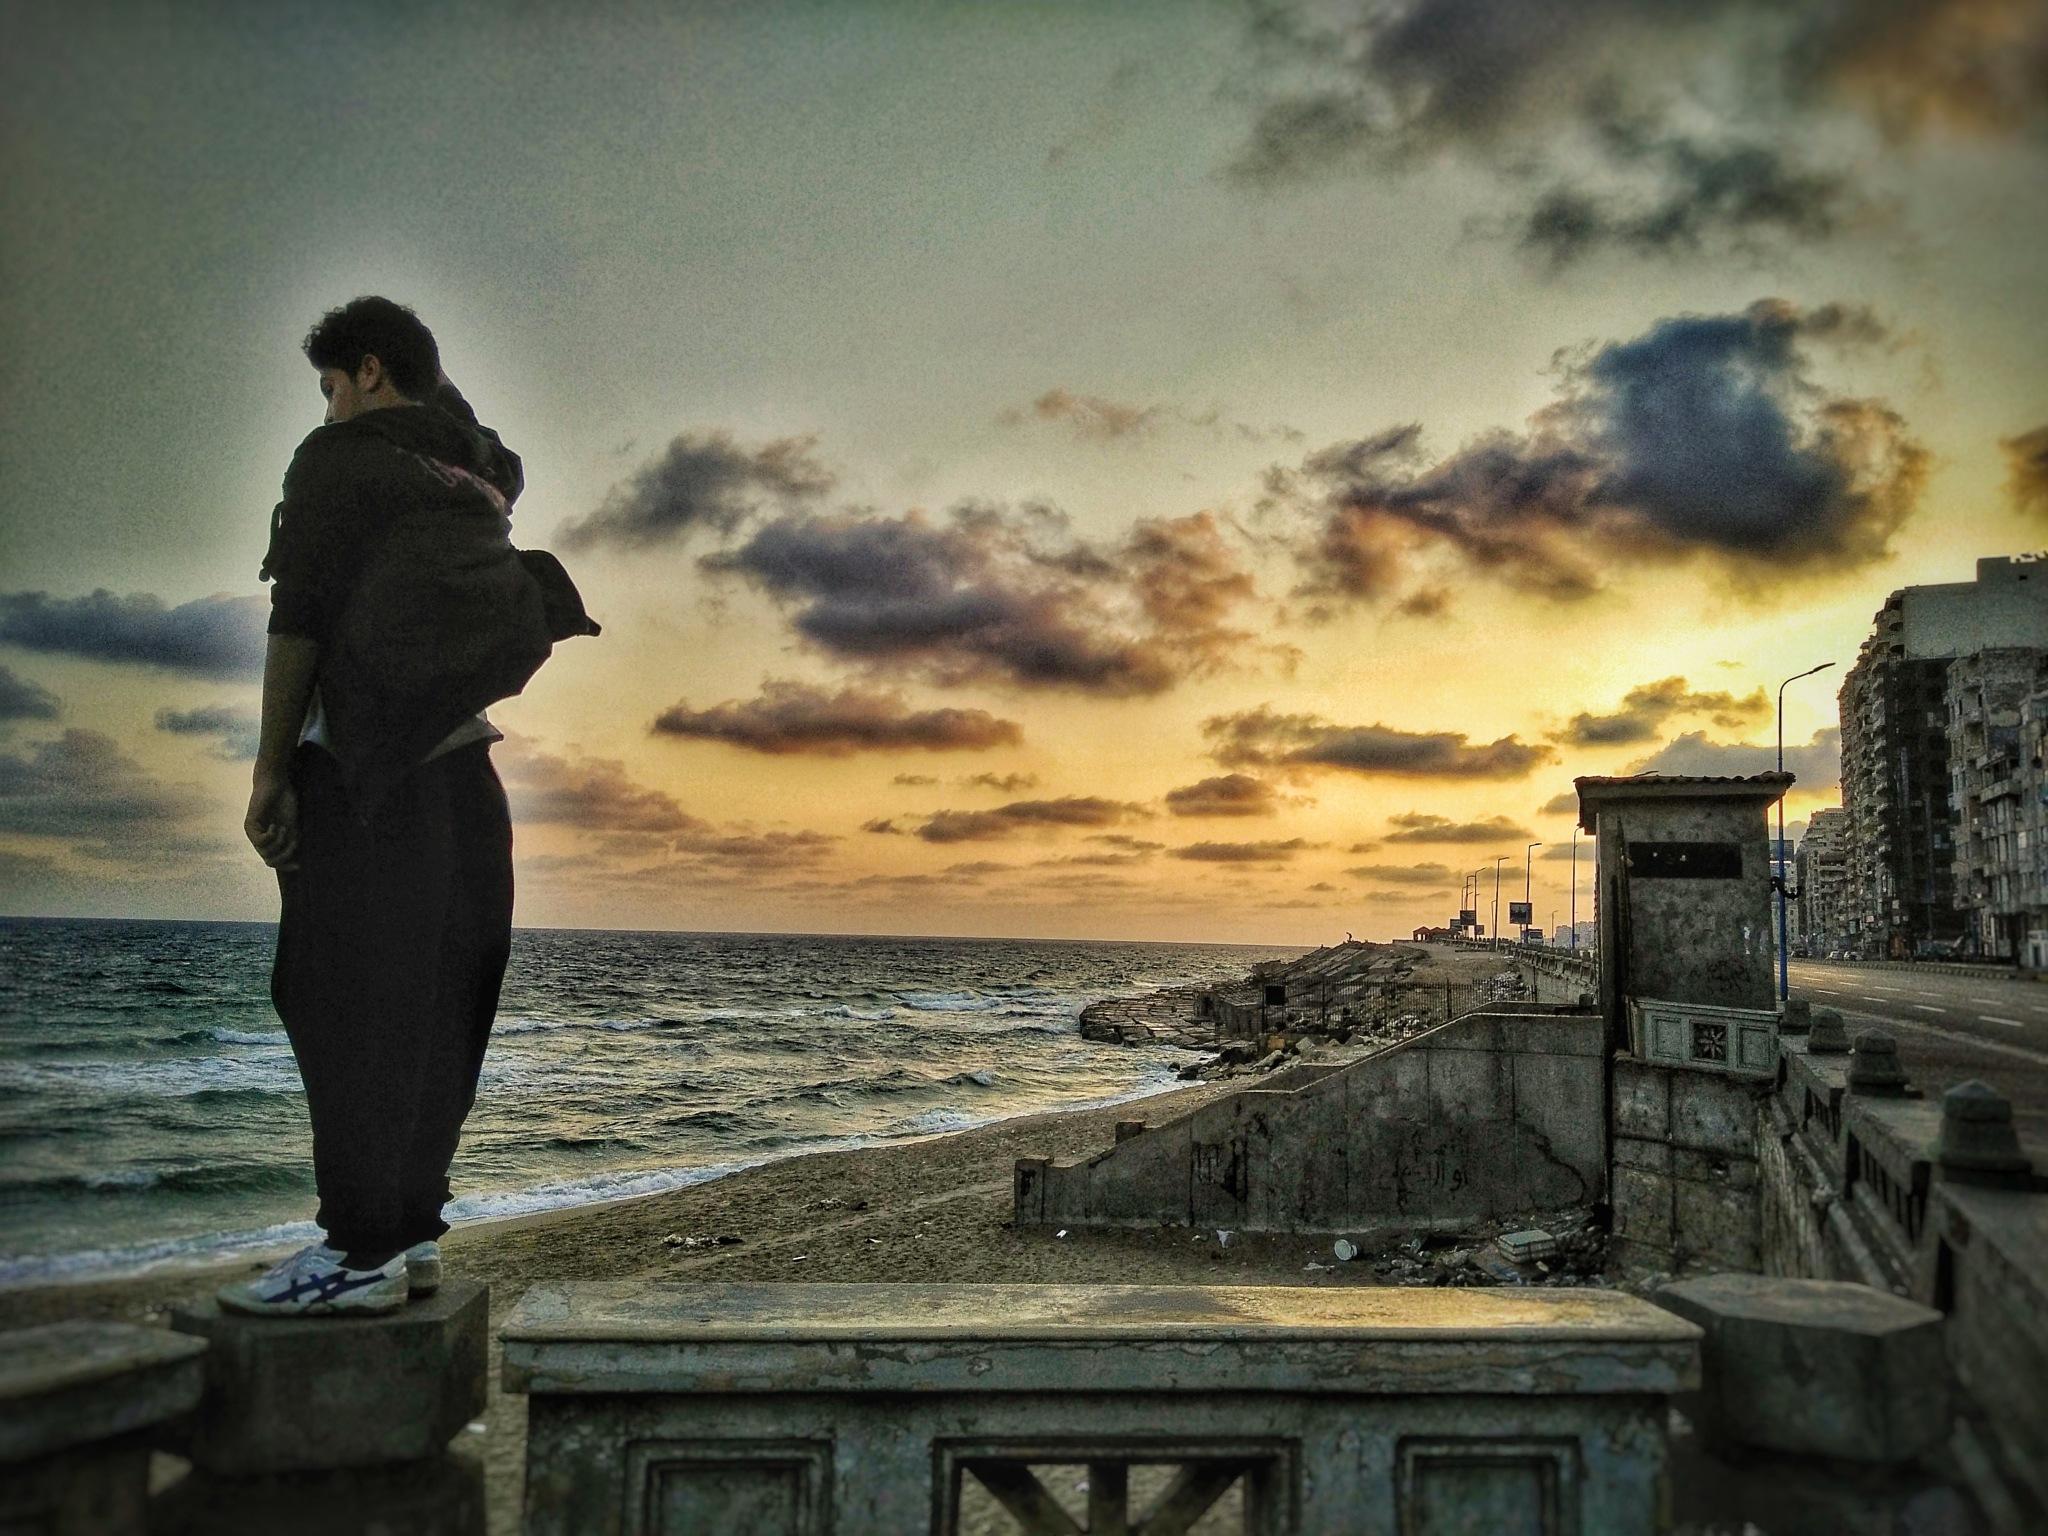 Untitled by Safei Elrahman Mohamed